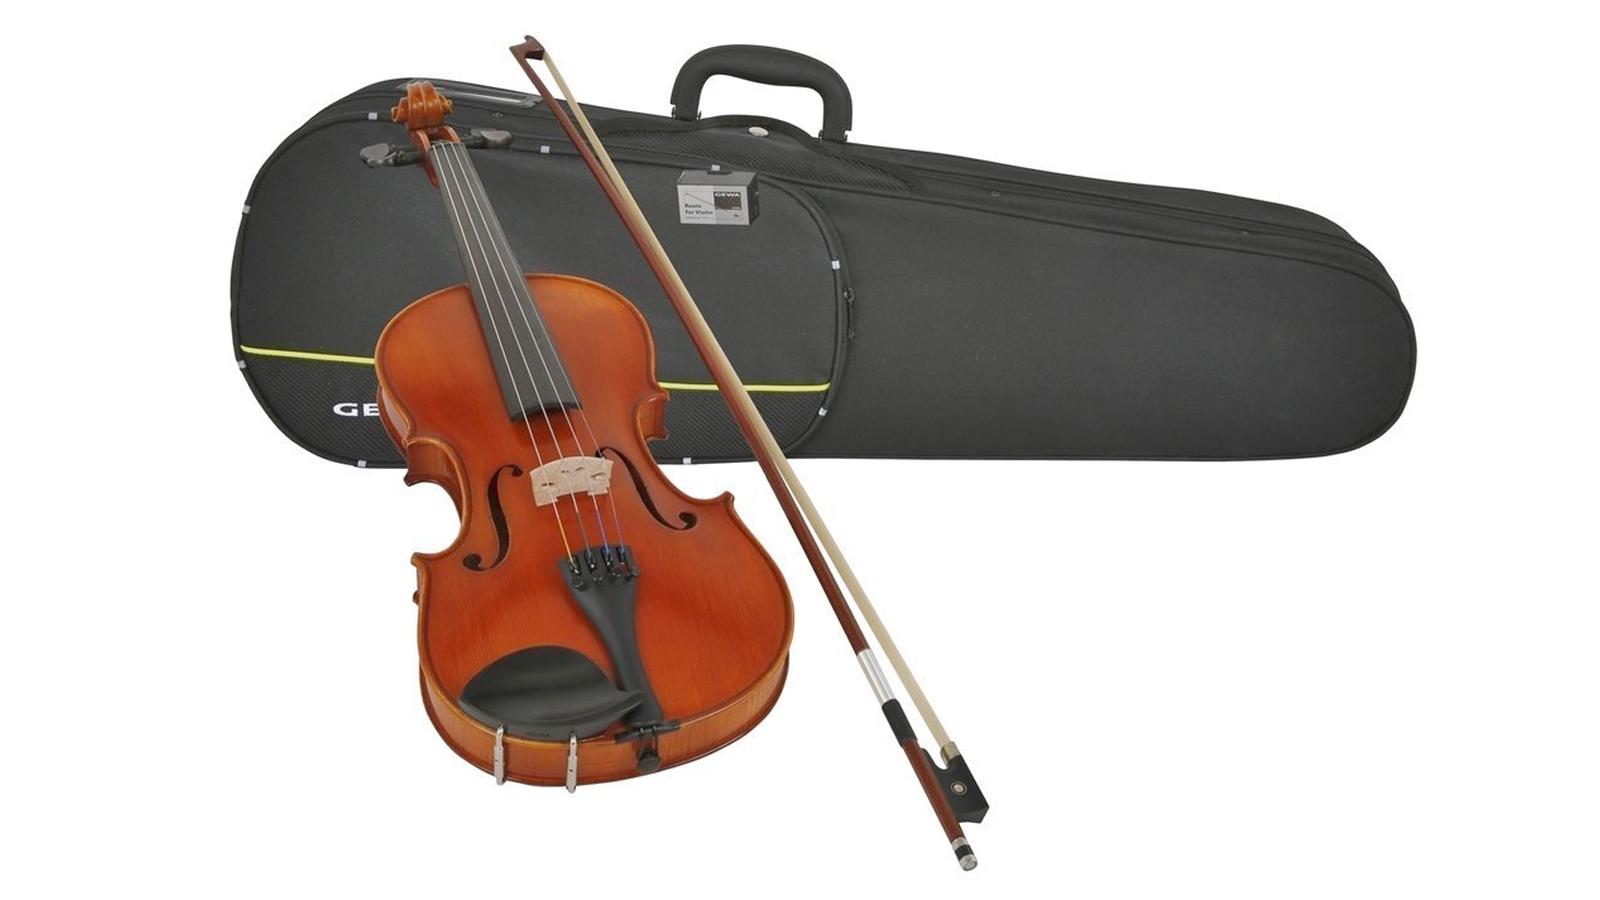 Gewa Aspirante Violingarnitur Marseille 3/4